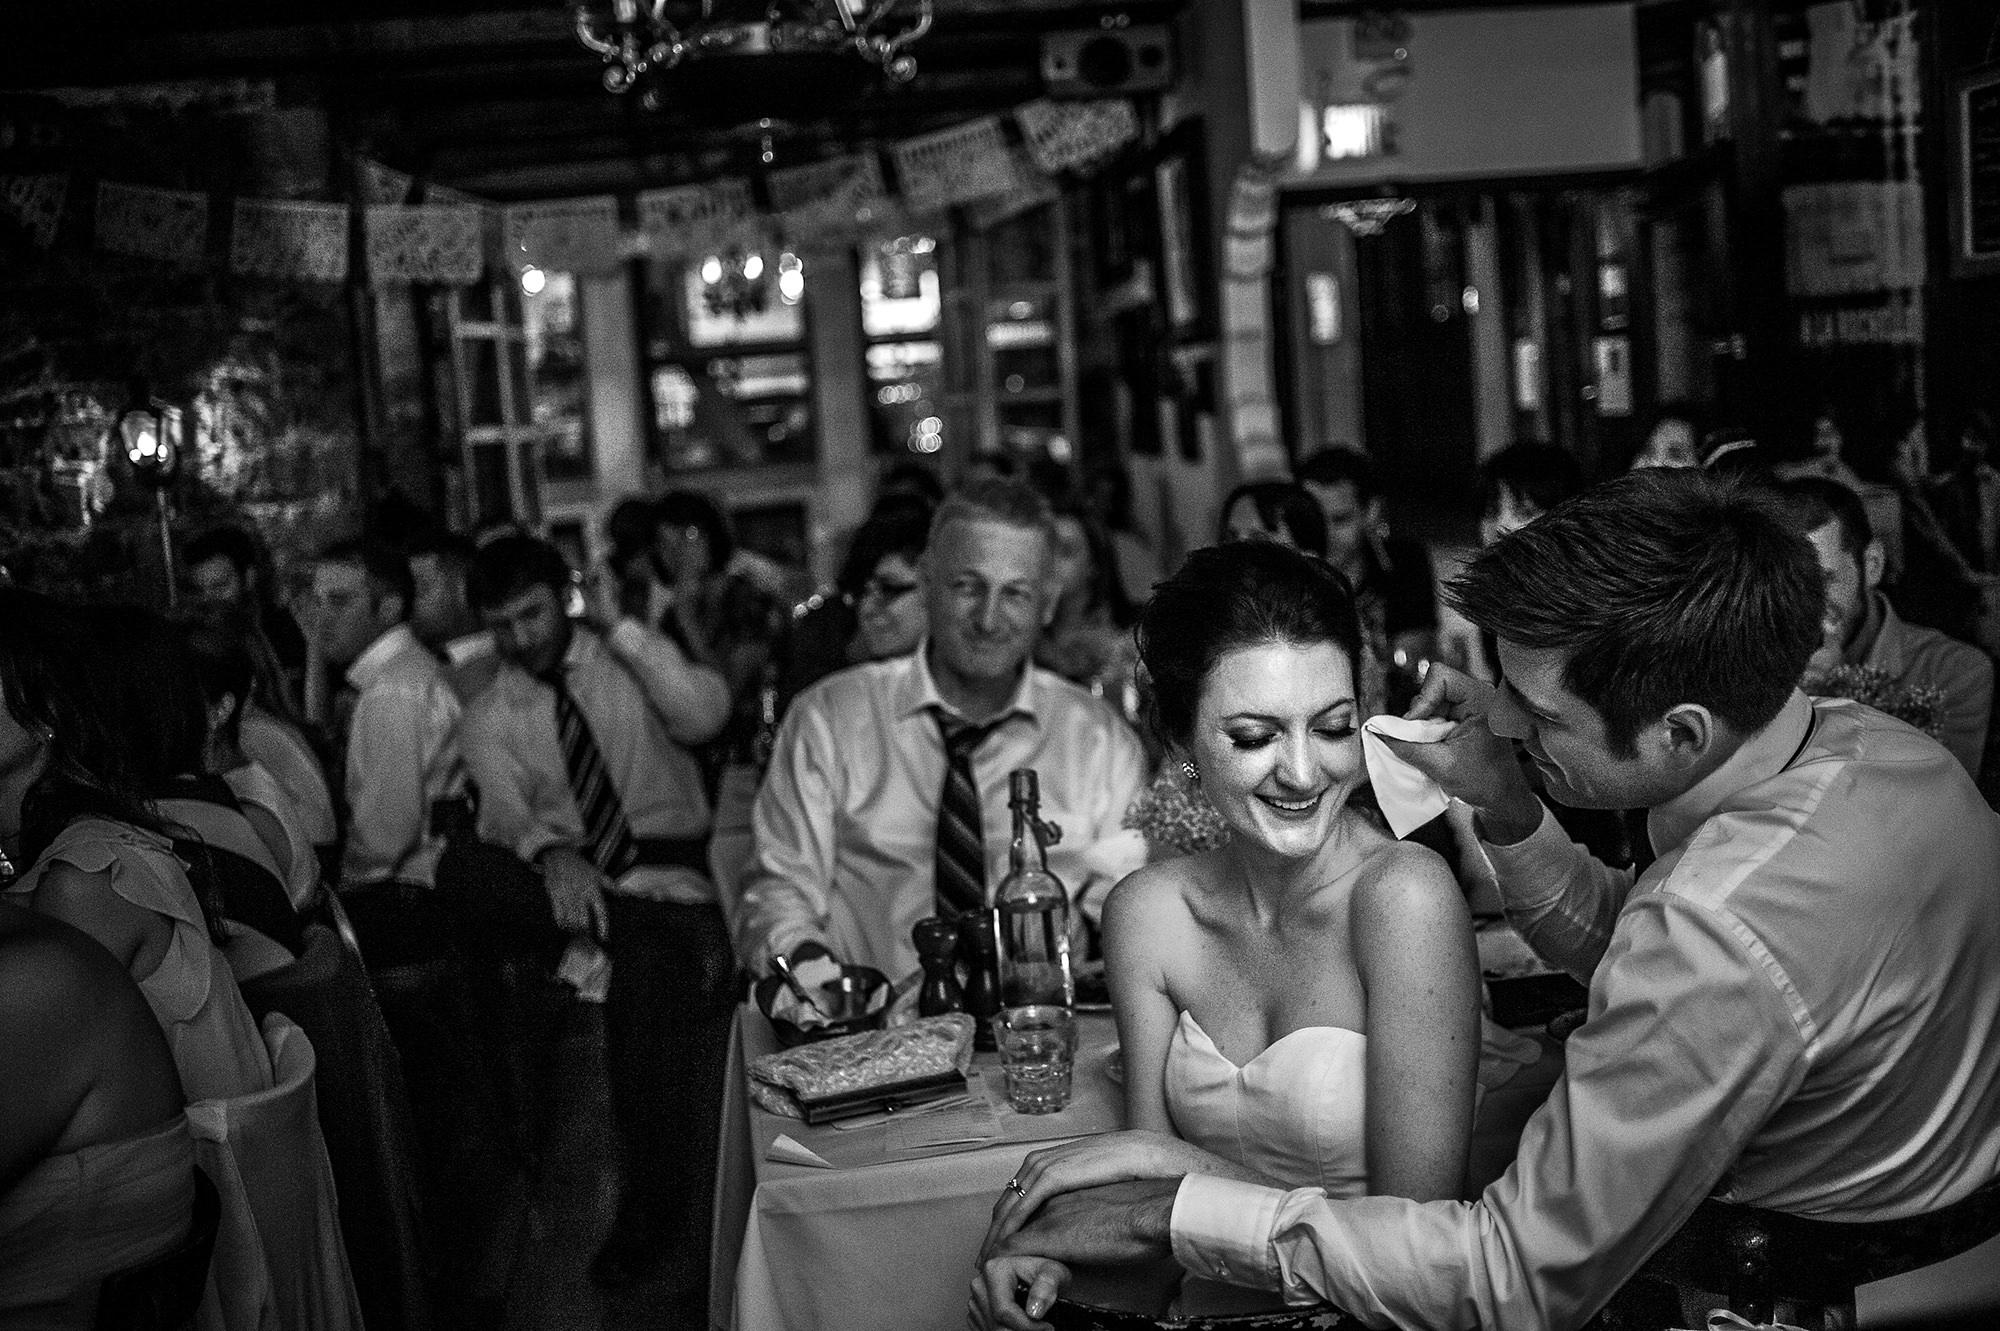 Groom wipes bride's tears at reception - Davina + Daniel